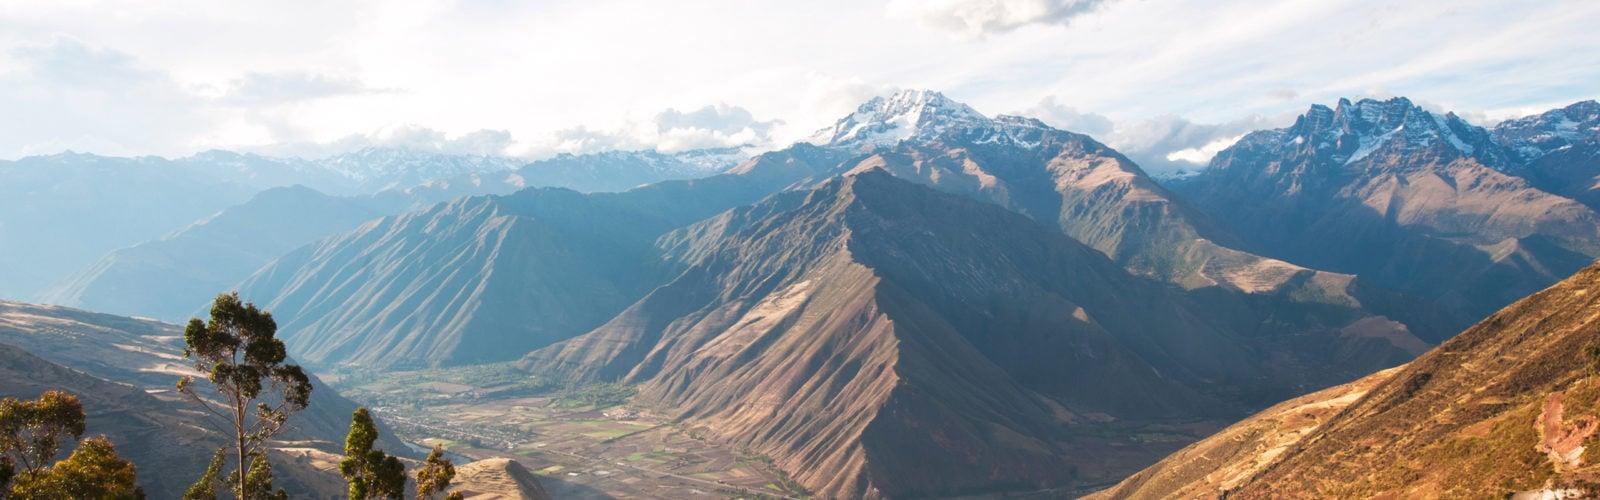 sacred-valley-peru